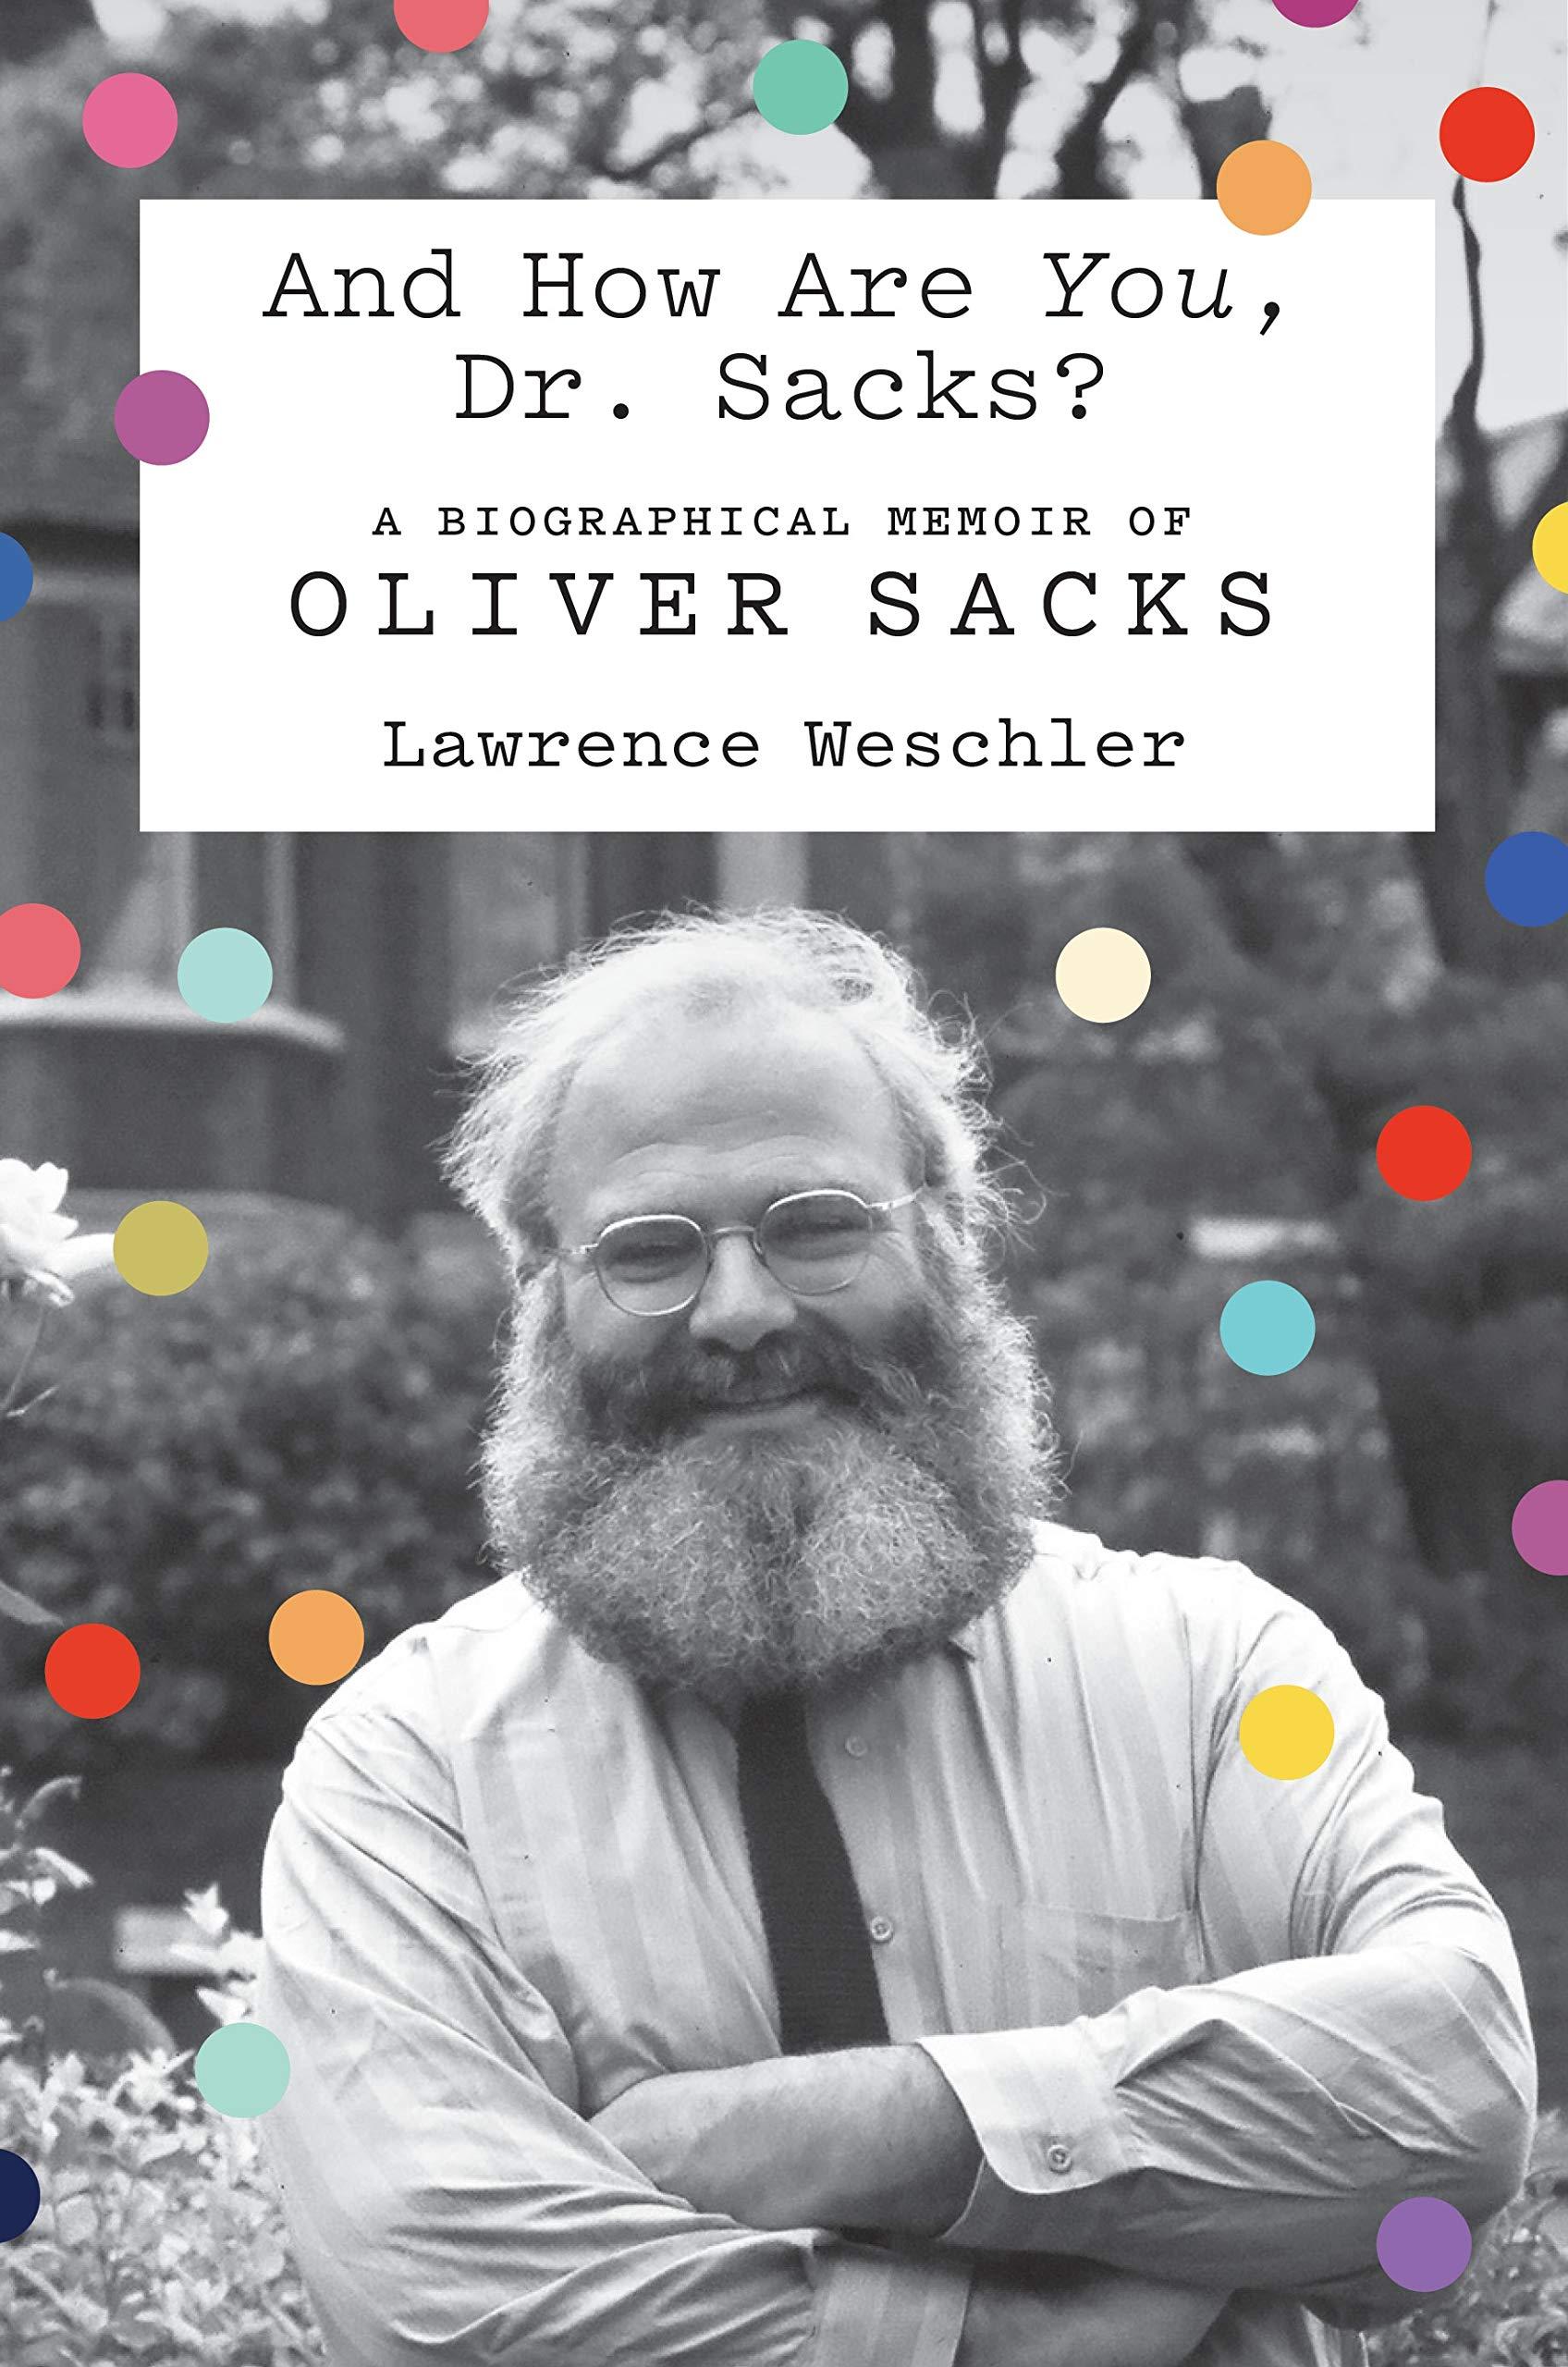 And How Are You, Dr. Sacks?: A Biographical Memoir of Oliver Sacks by Farrar, Straus and Giroux